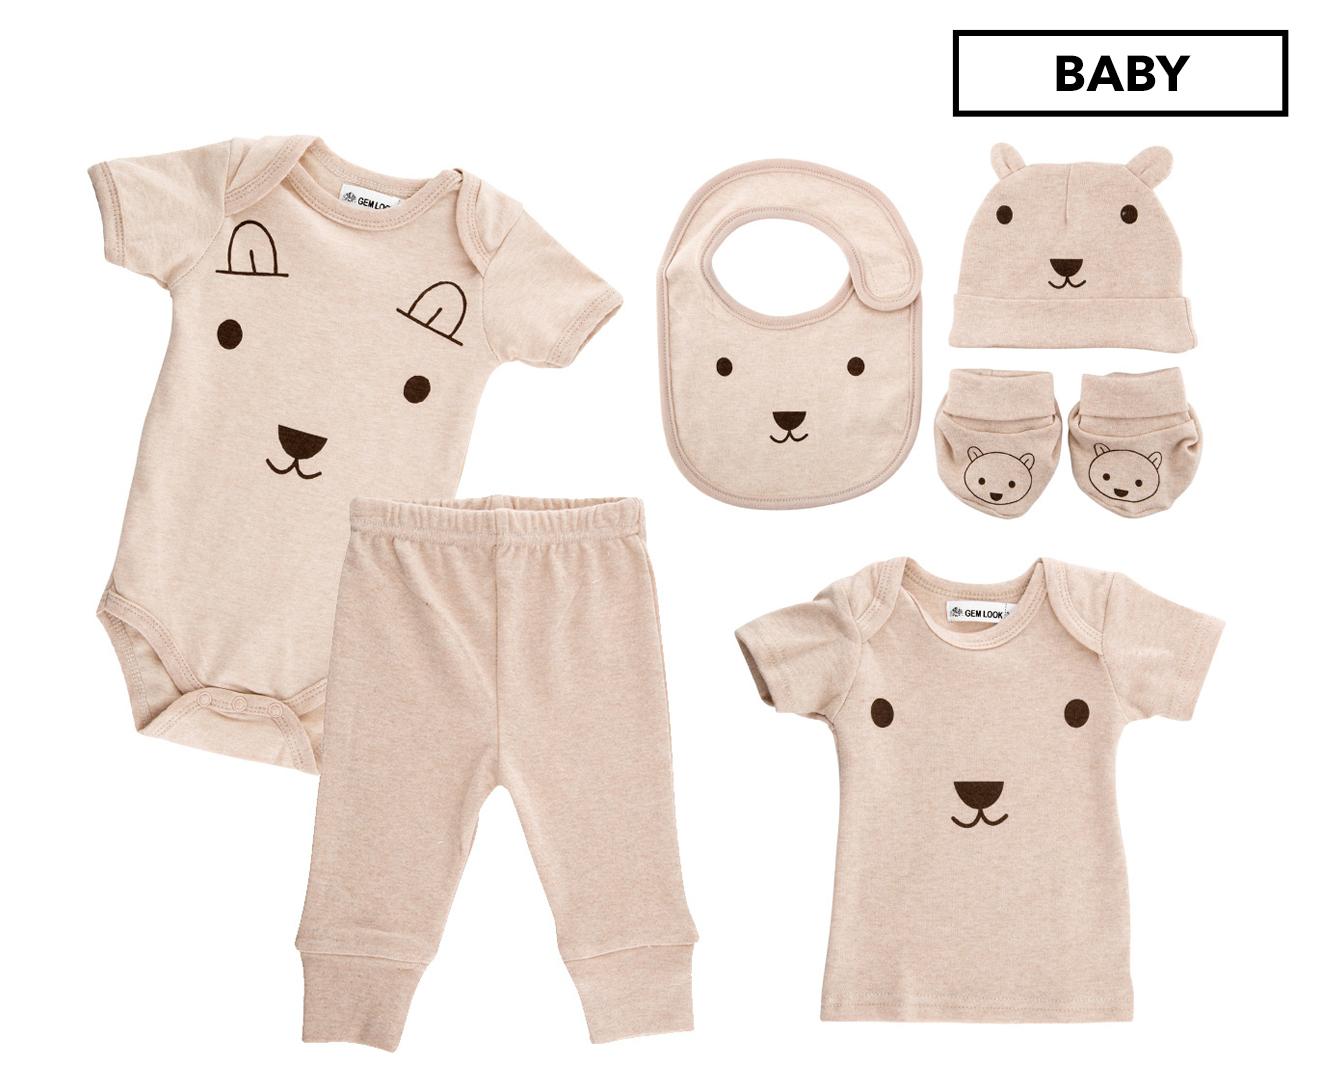 Gem Look Baby Size 0-6 Months Teddy Bear Organic Cotton 6-Piece Set